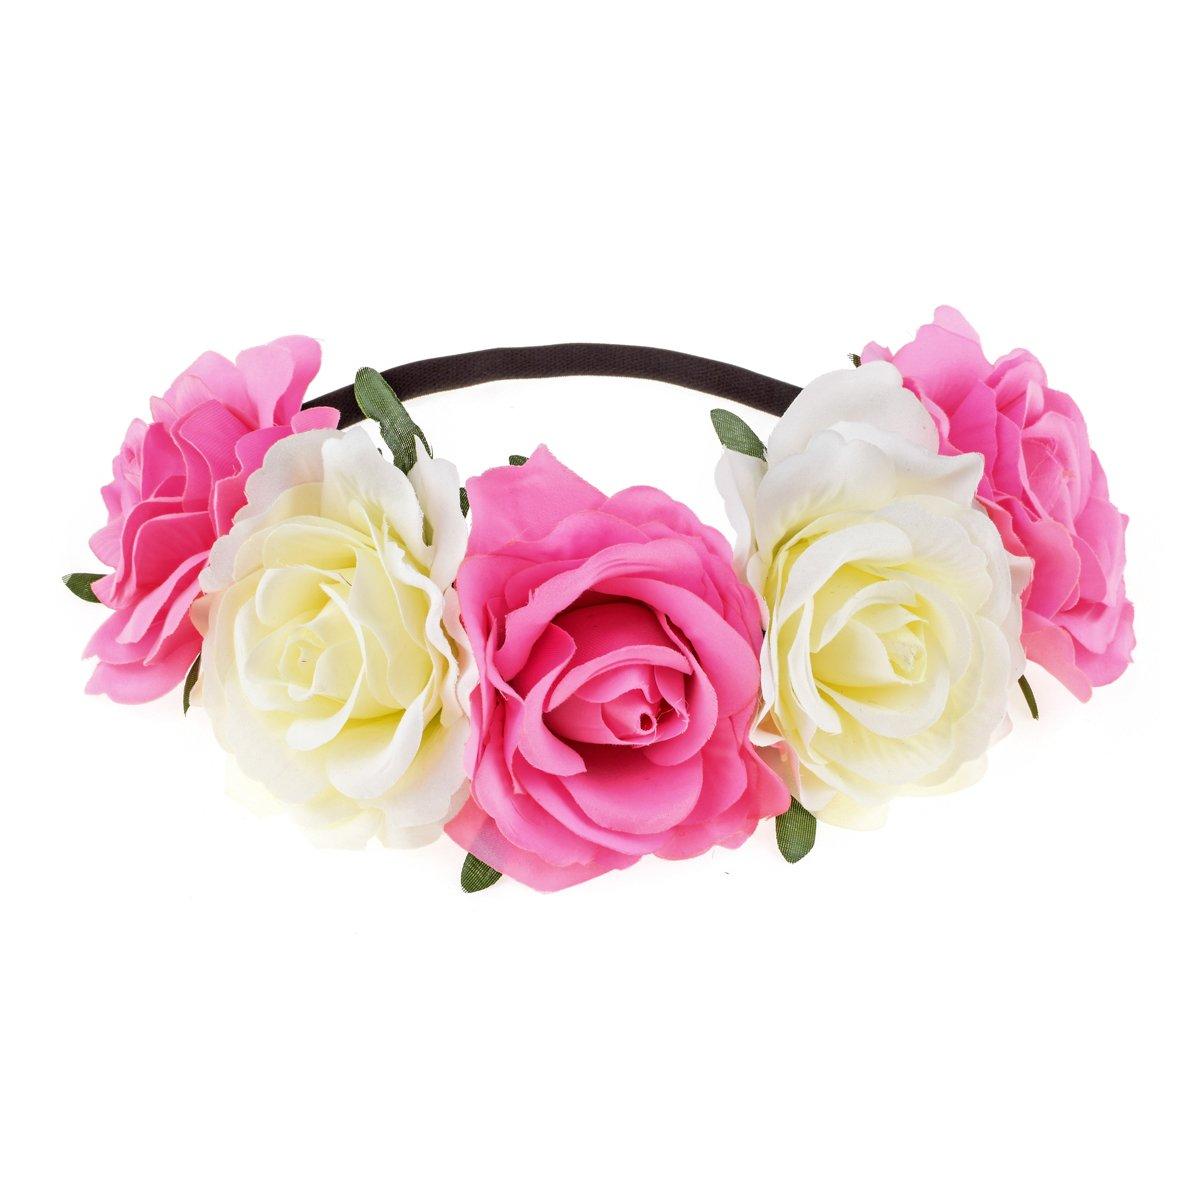 Dreamlily Womens Hawaiian Stretch Flower Headband For Garland Party